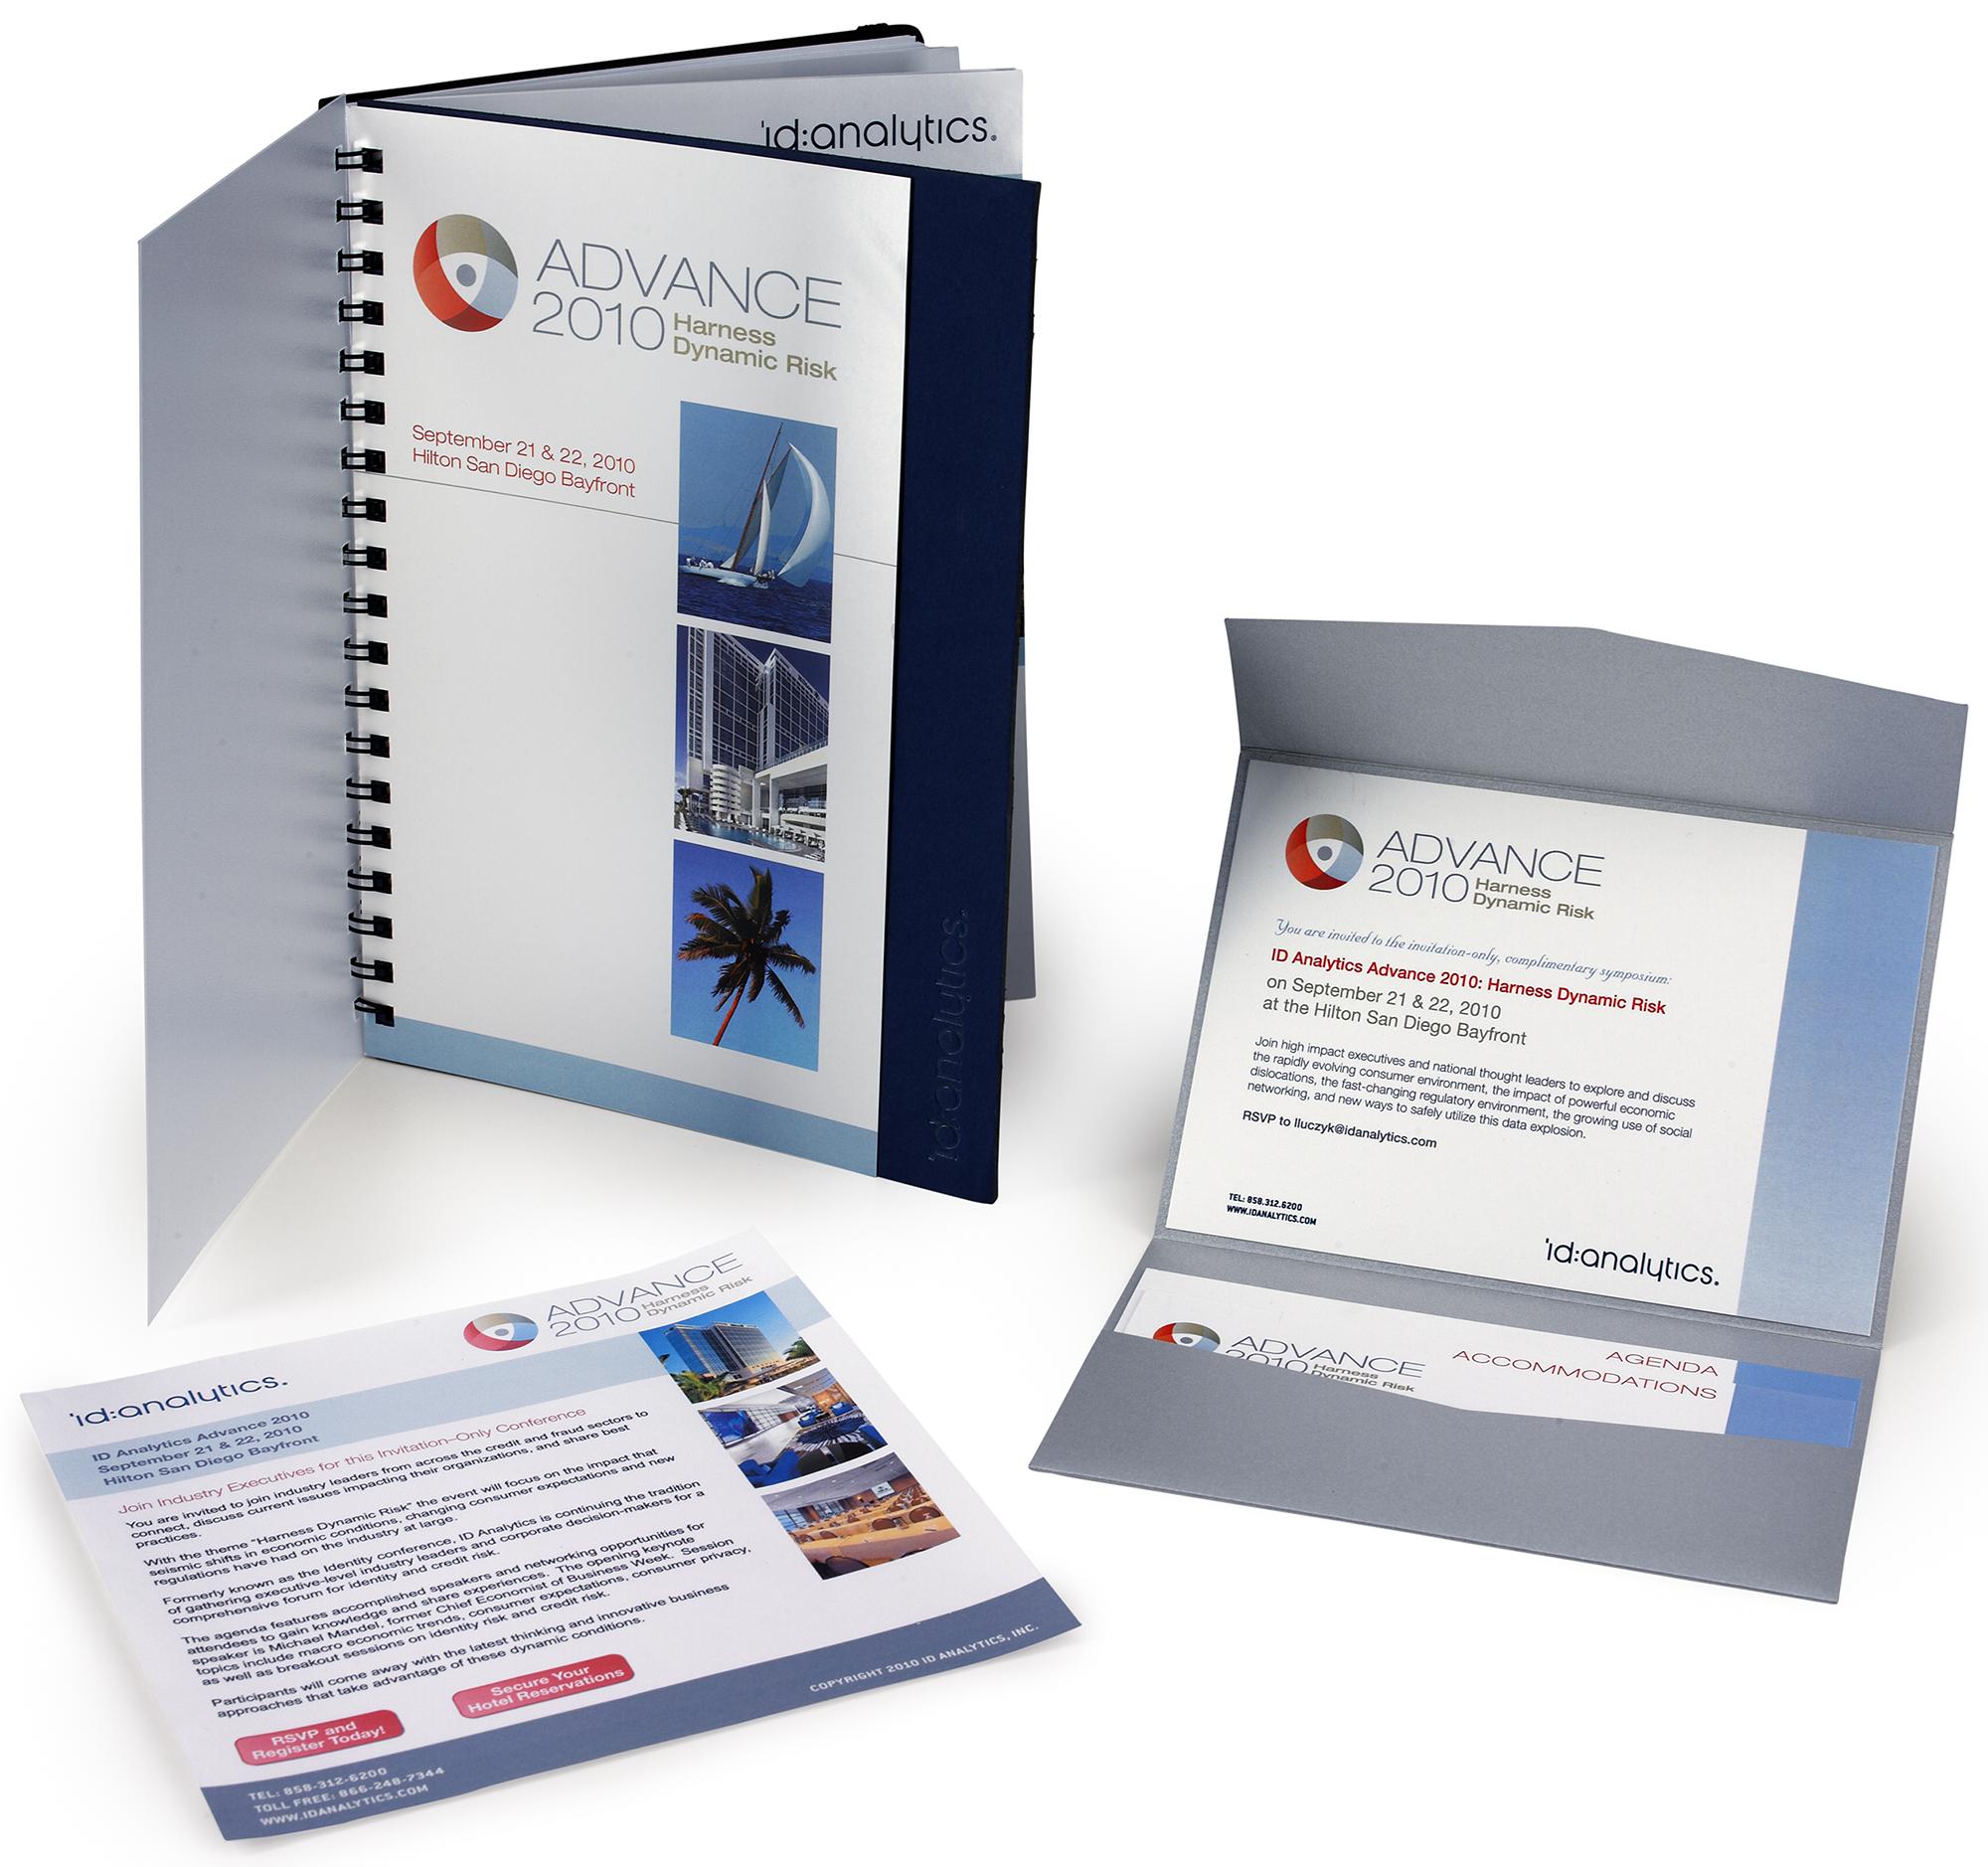 The E-blast, Workbook/Program and Invitation Package